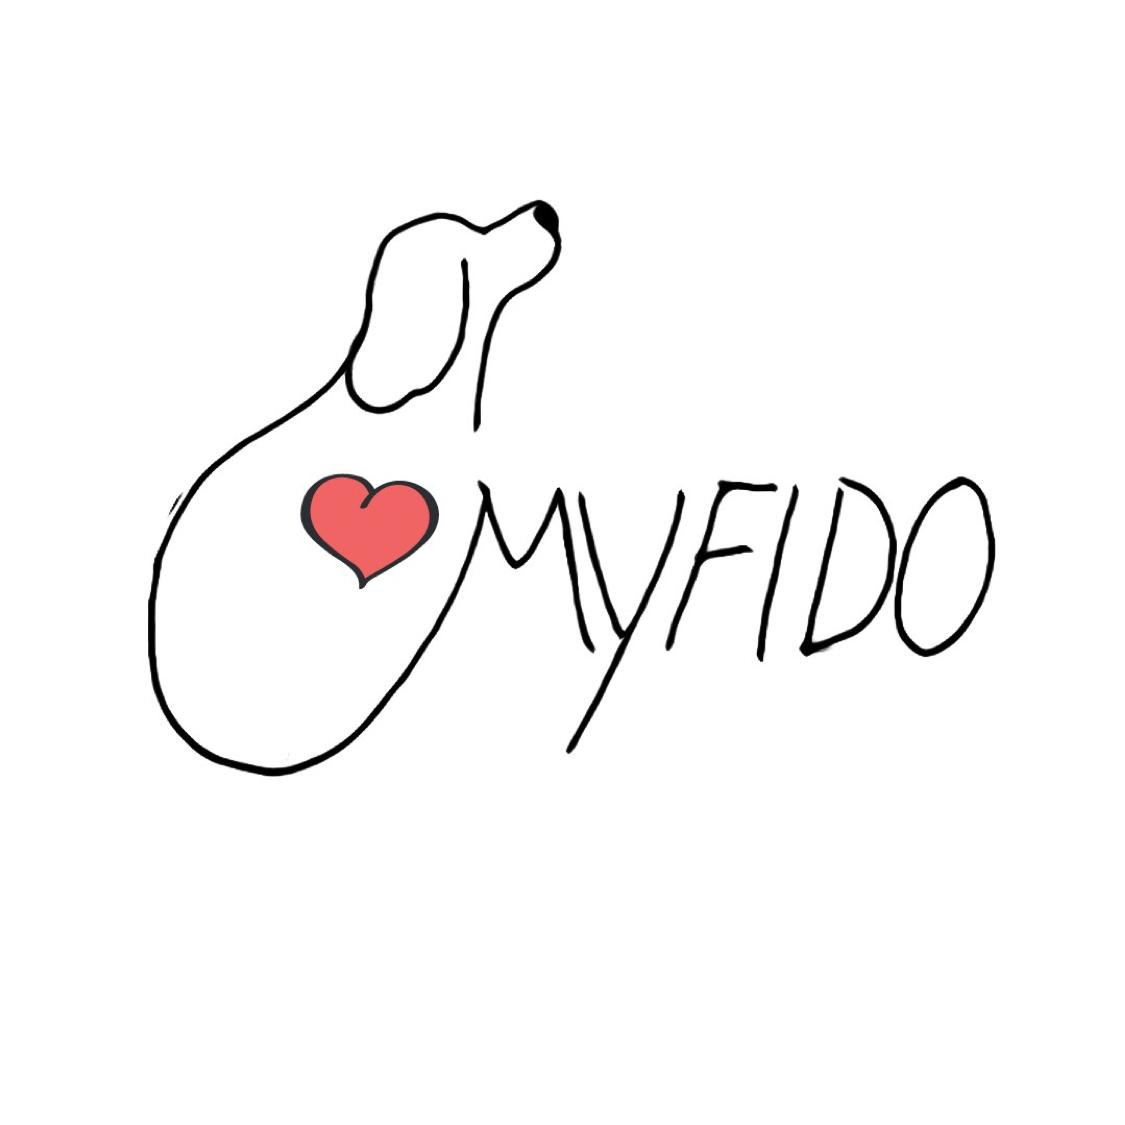 MyFido